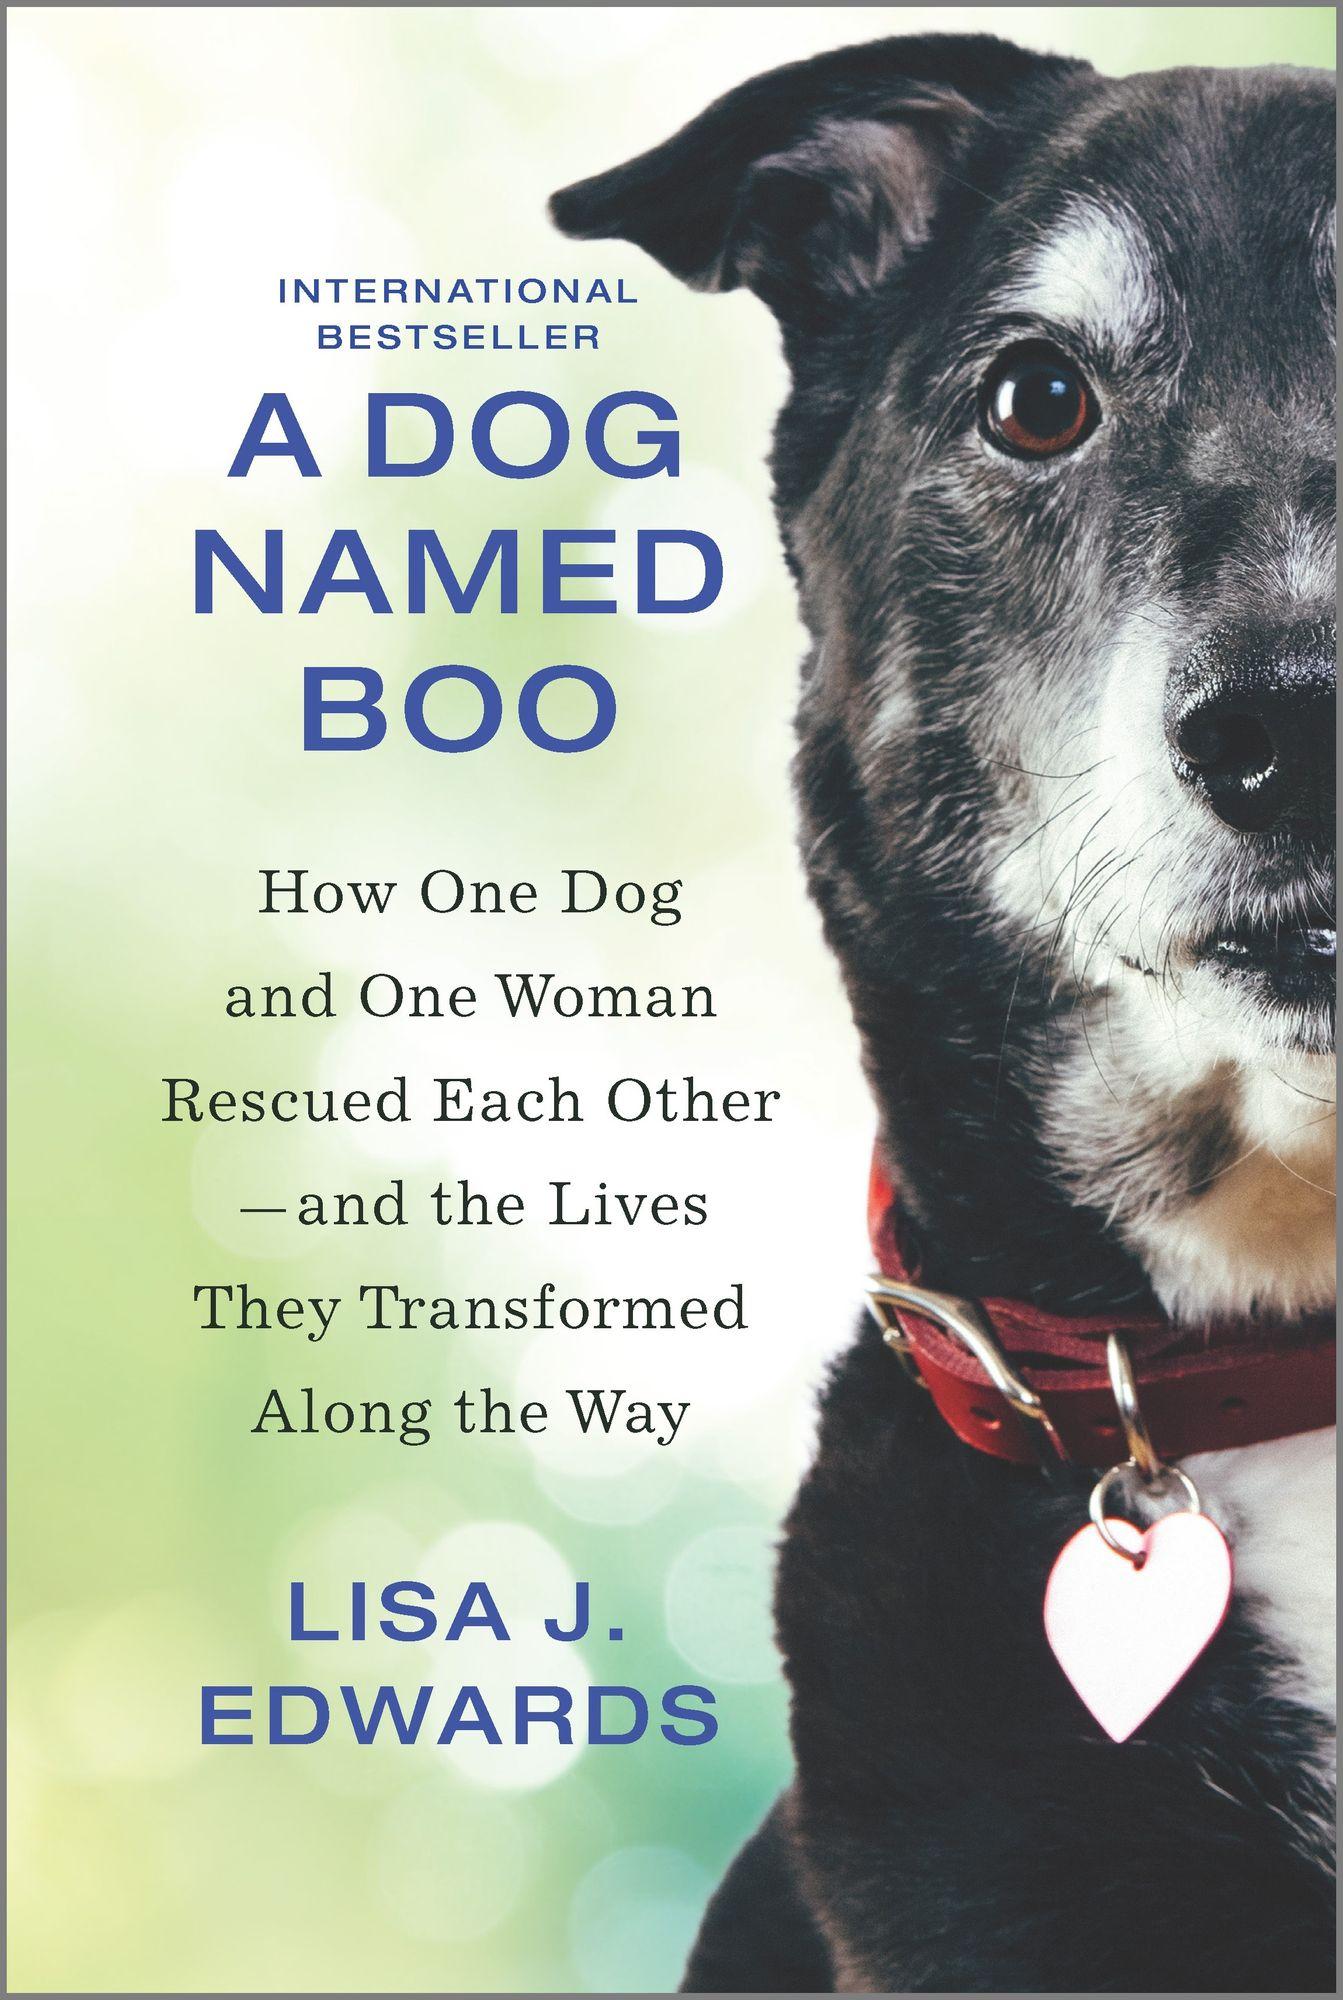 A Dog Named Book by Lisa J. Edwards